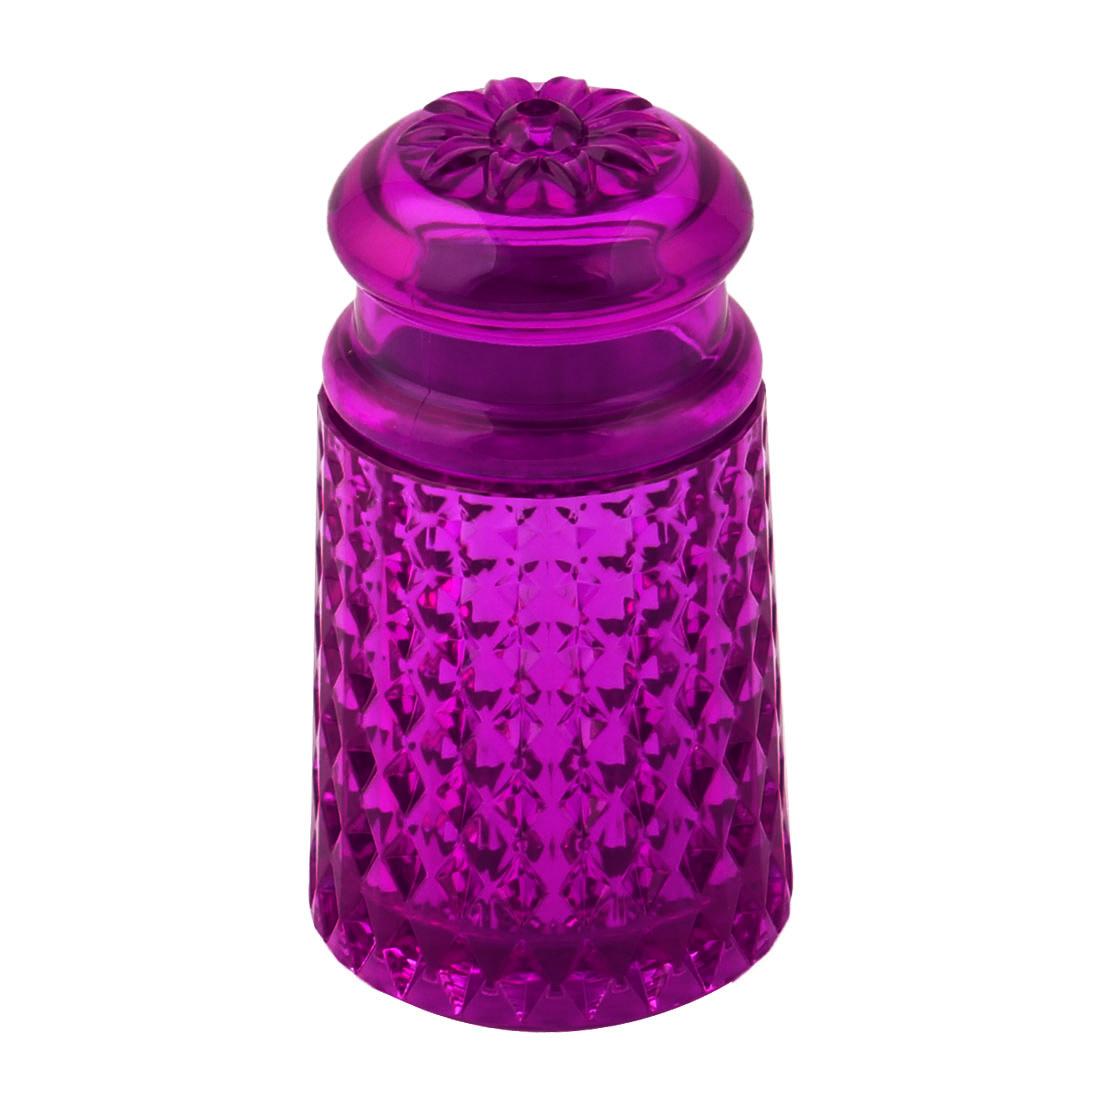 Home Kitchen Plastic Can Flower Pattern Head Toothpick Holder Storage Box Purple